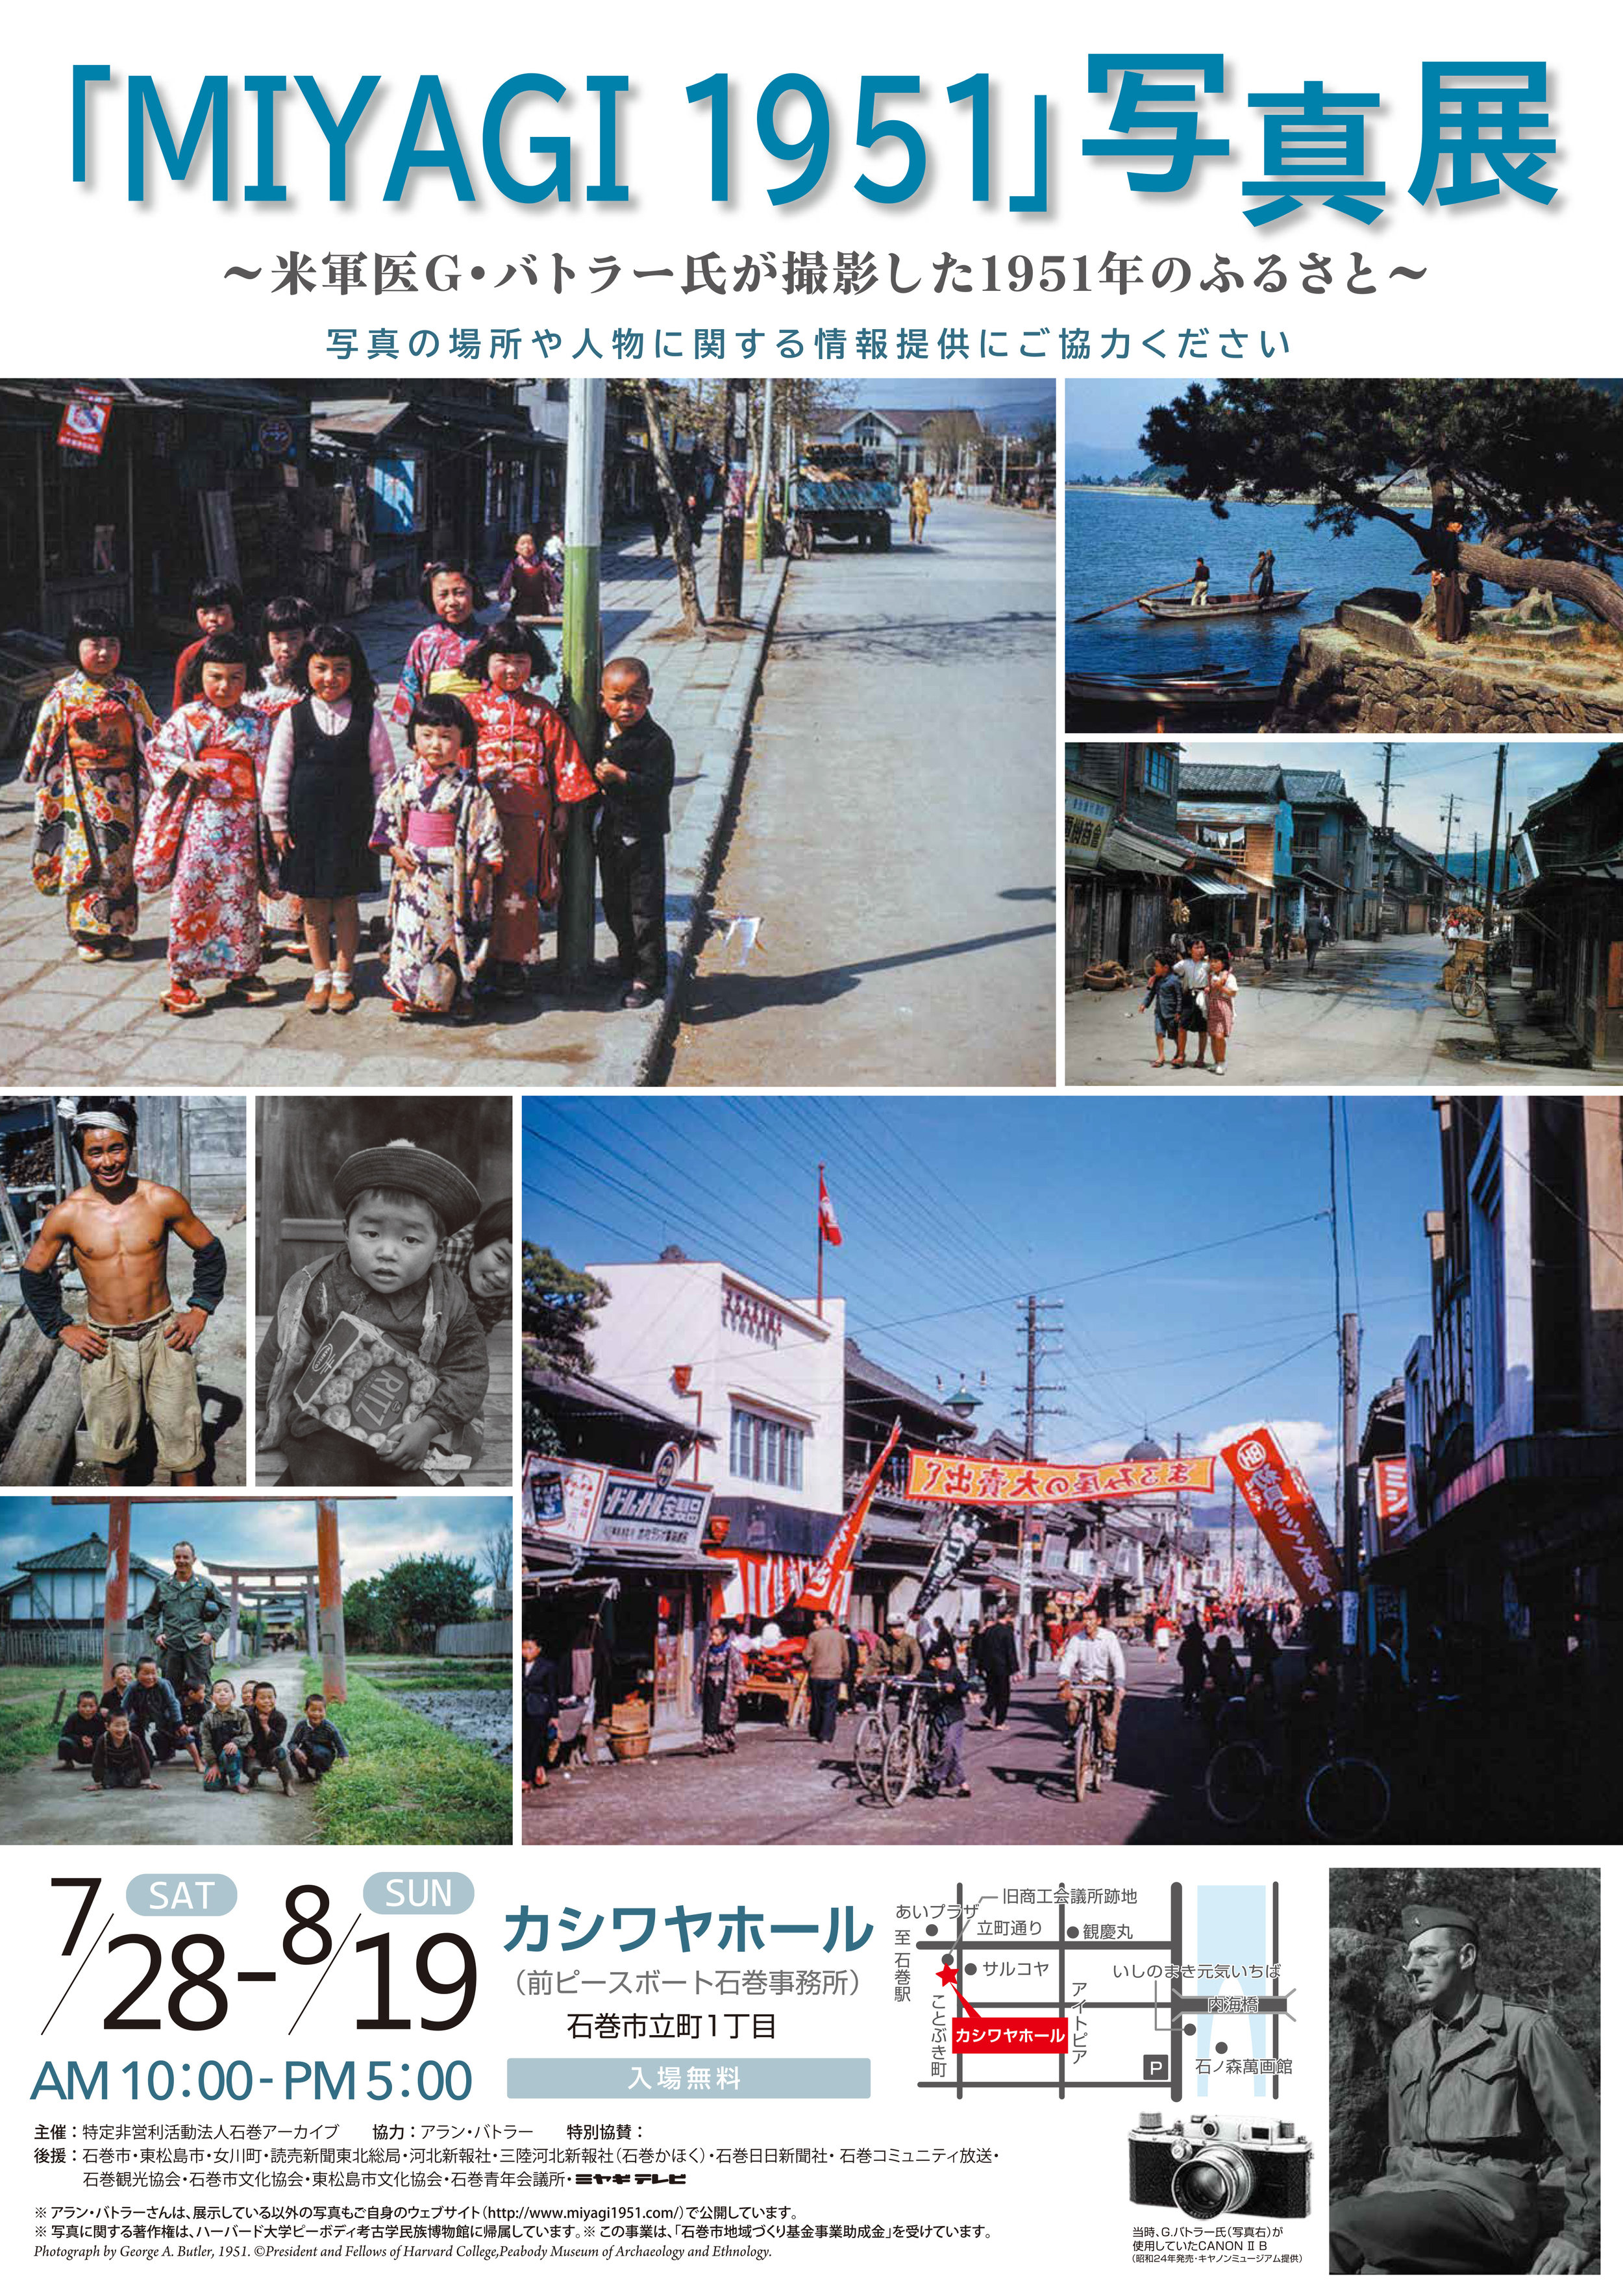 Ishinomaki Poster-large.jpg